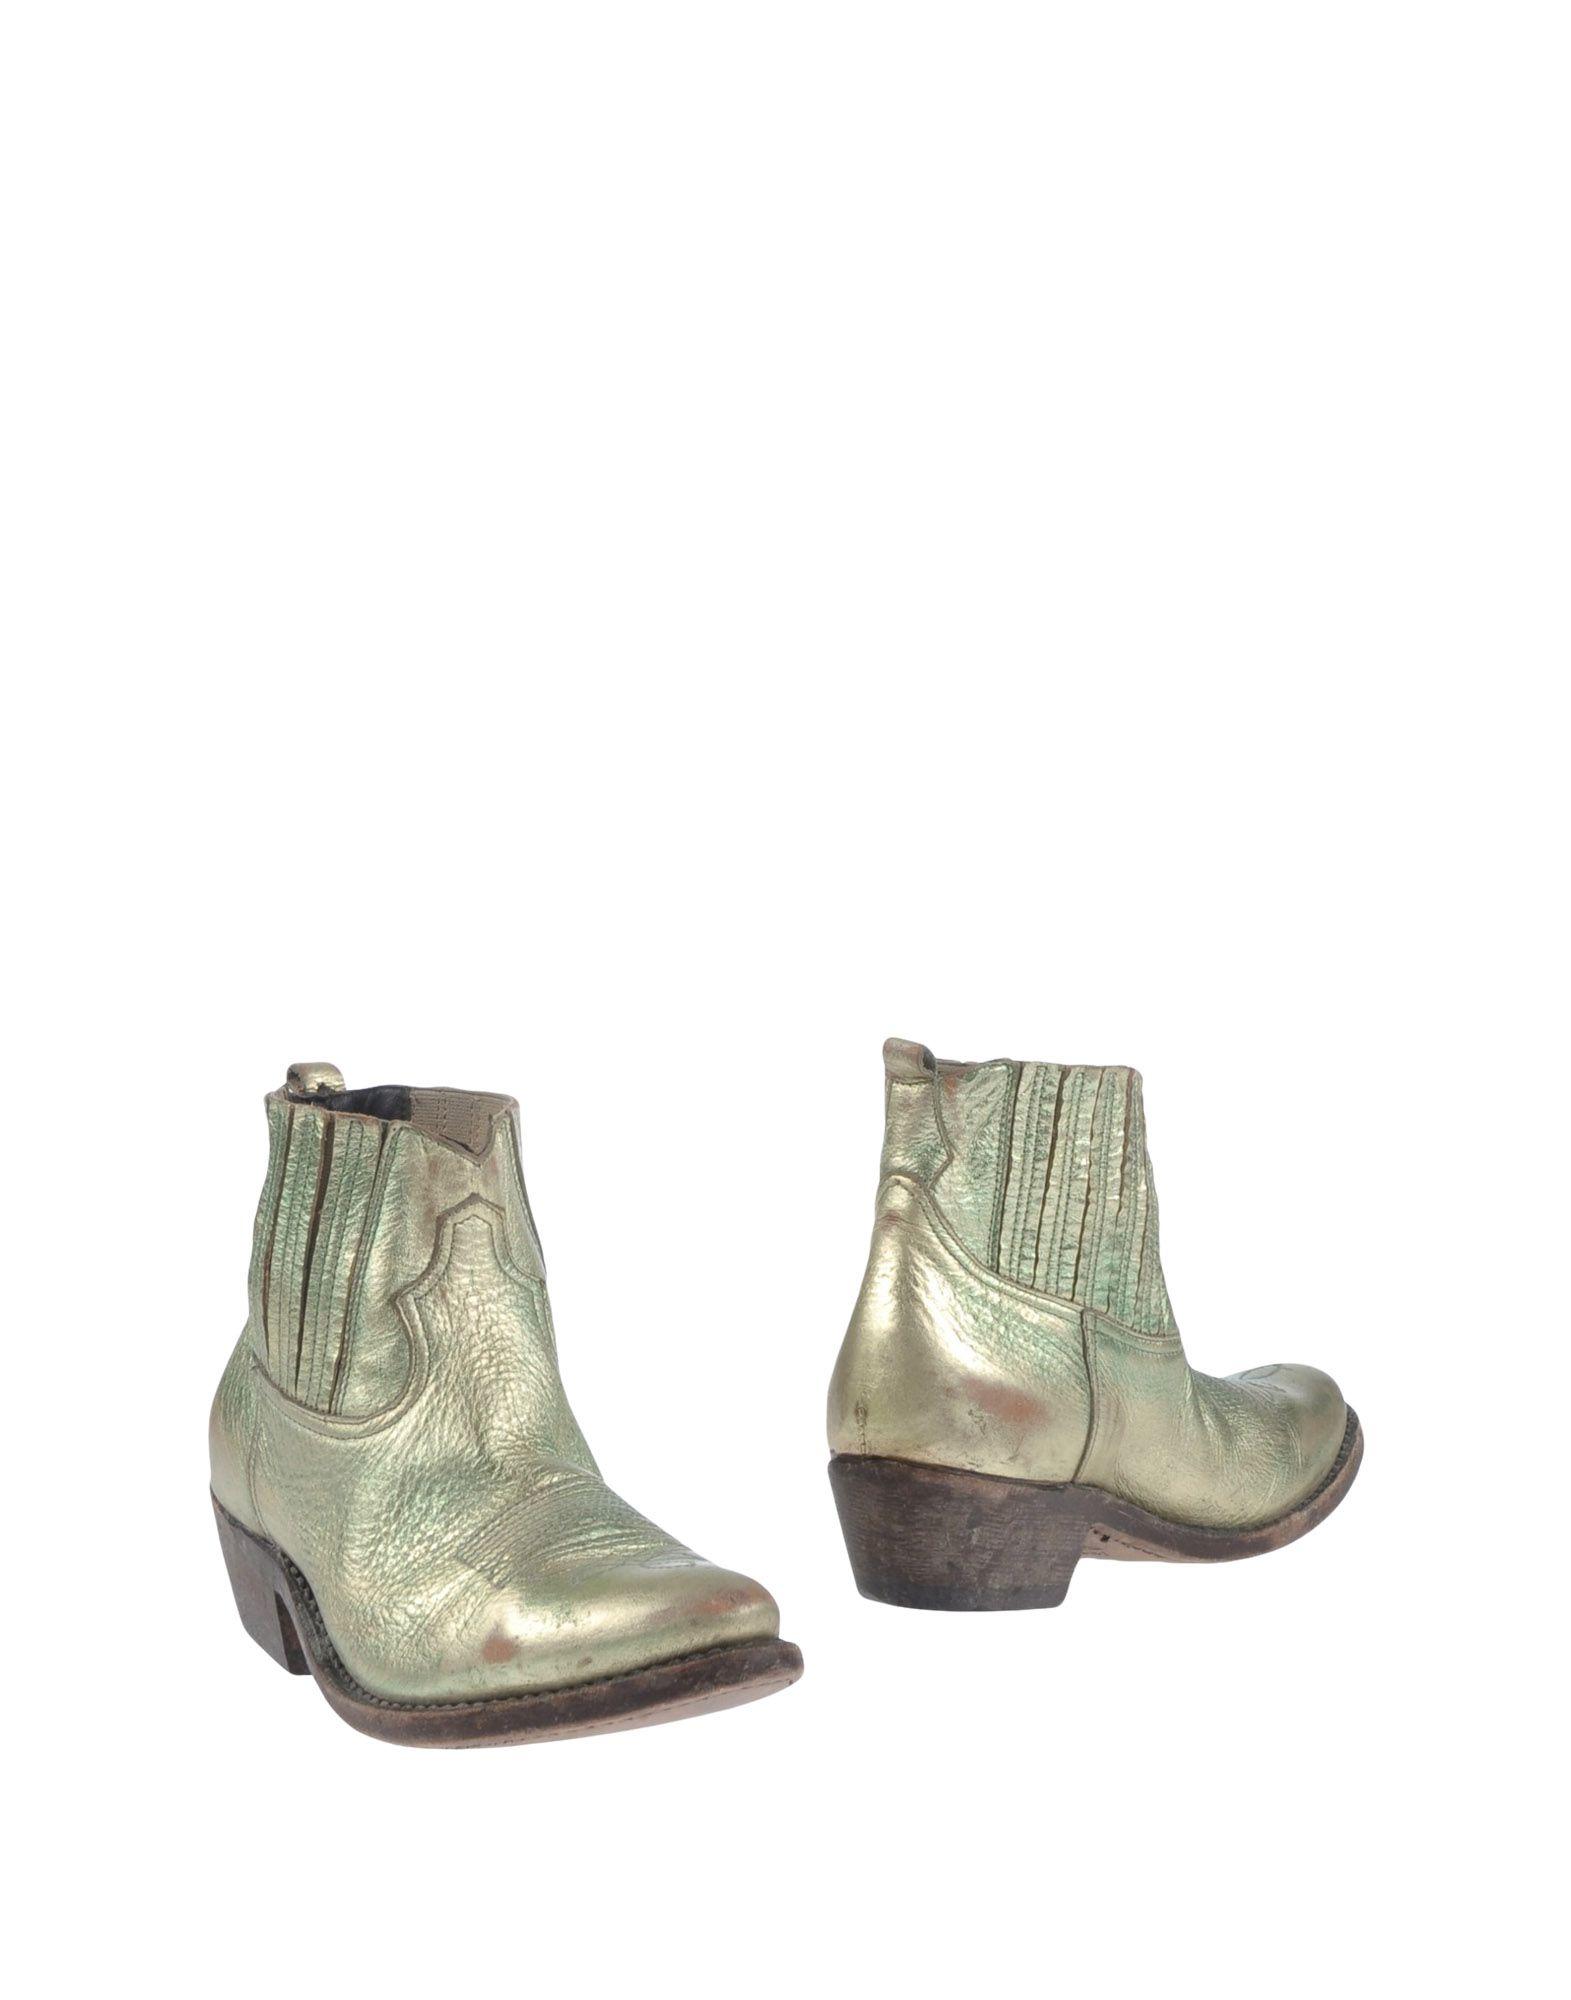 Chelsea Boots Golden Goose Deluxe Brand Donna - 11005877EV